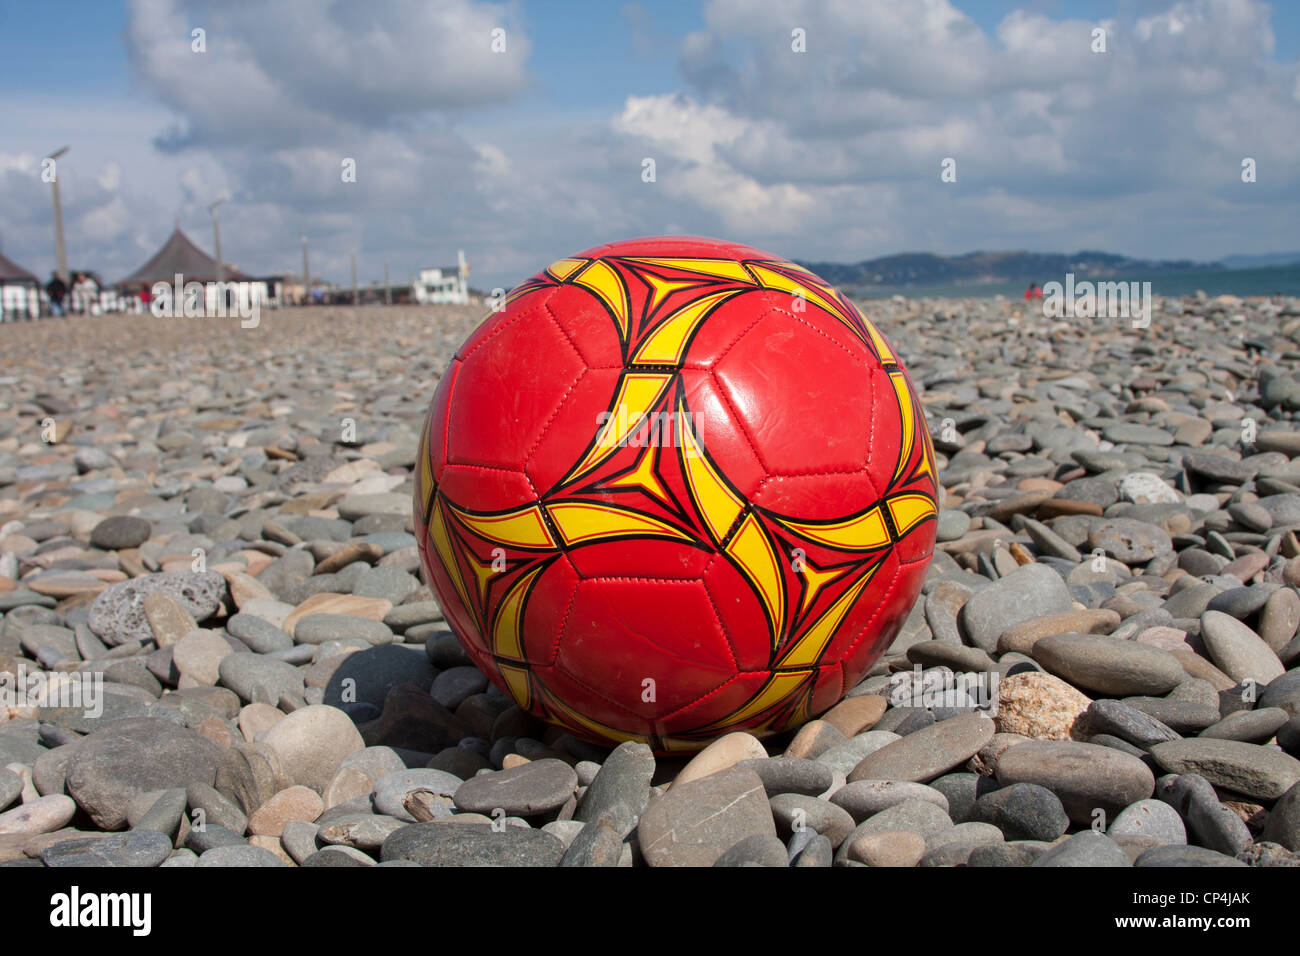 A football on a stony beach - Stock Image